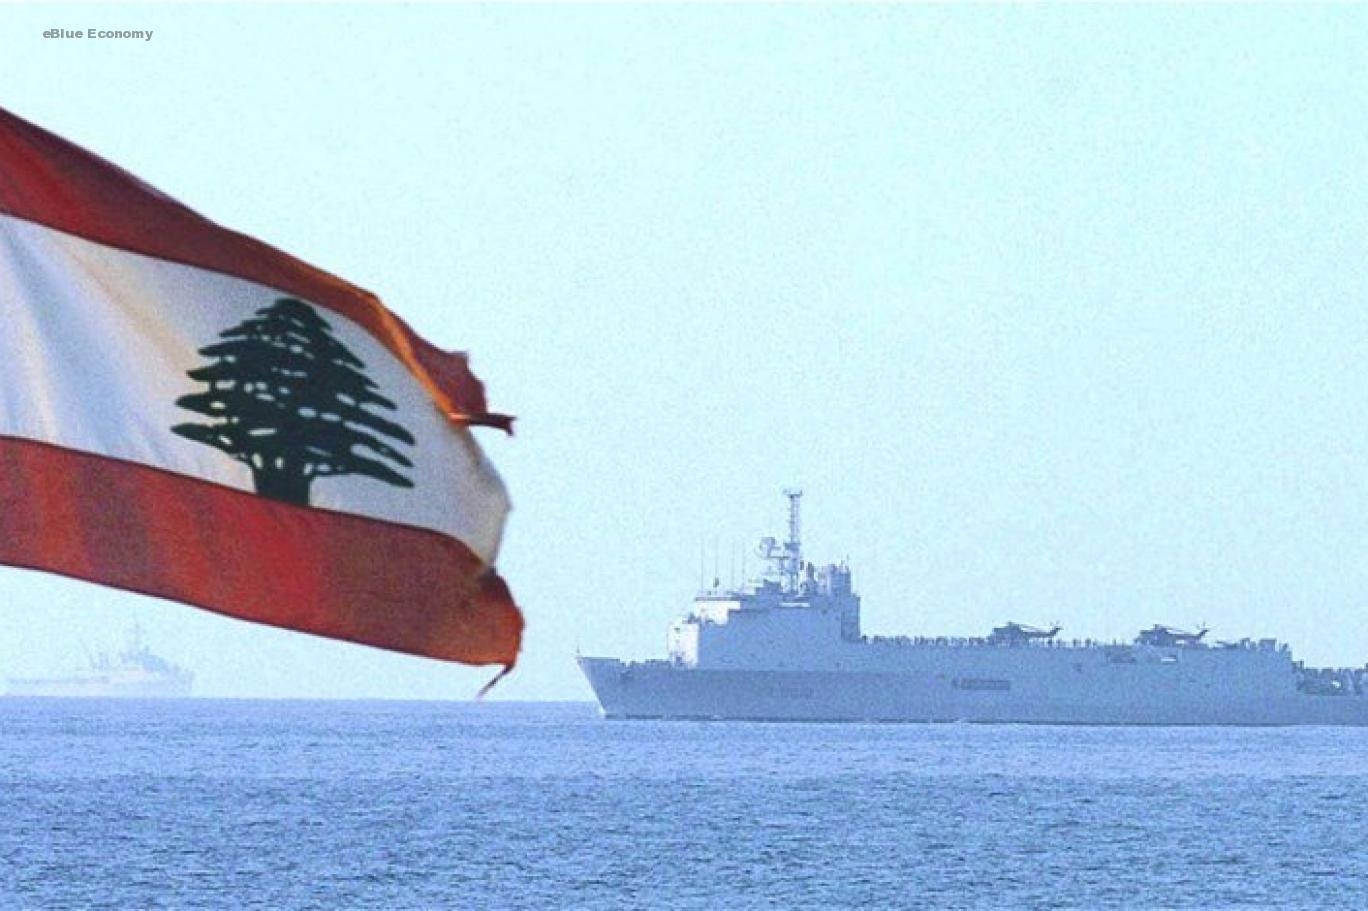 eBlue_economy_ترسيم الحدود البحرية بين لبنان وإسرائيل